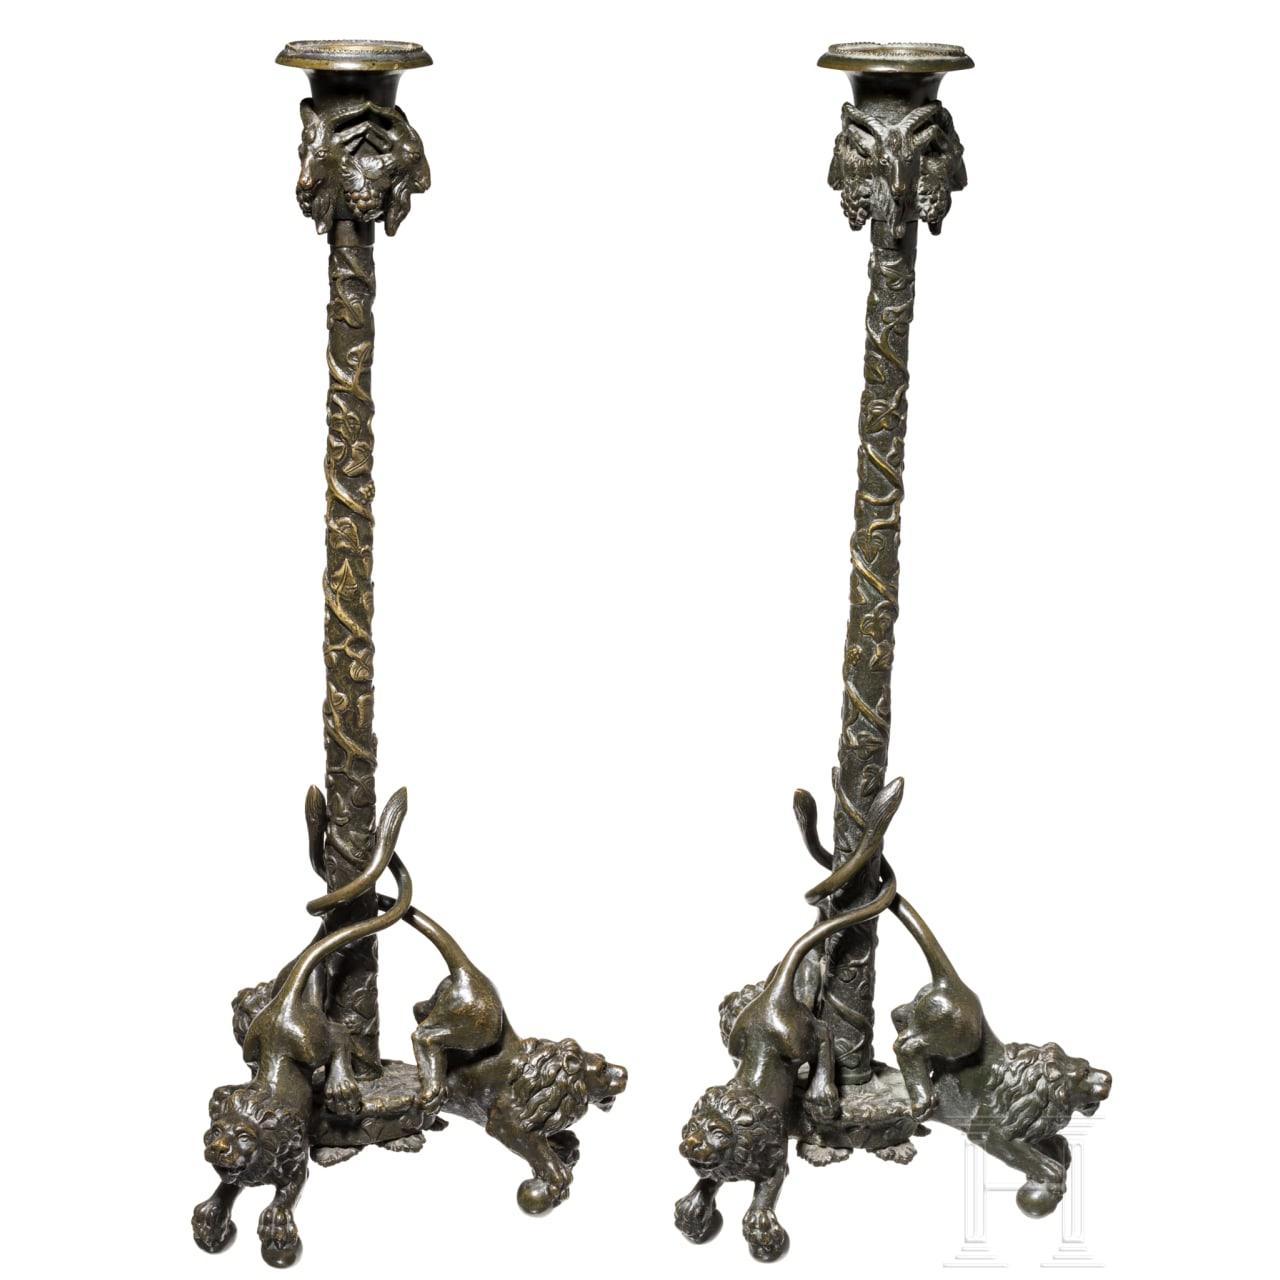 Feines Paar Bronze-Kandelaber im Renaissance-Stil, Italien, 19. Jhdt.